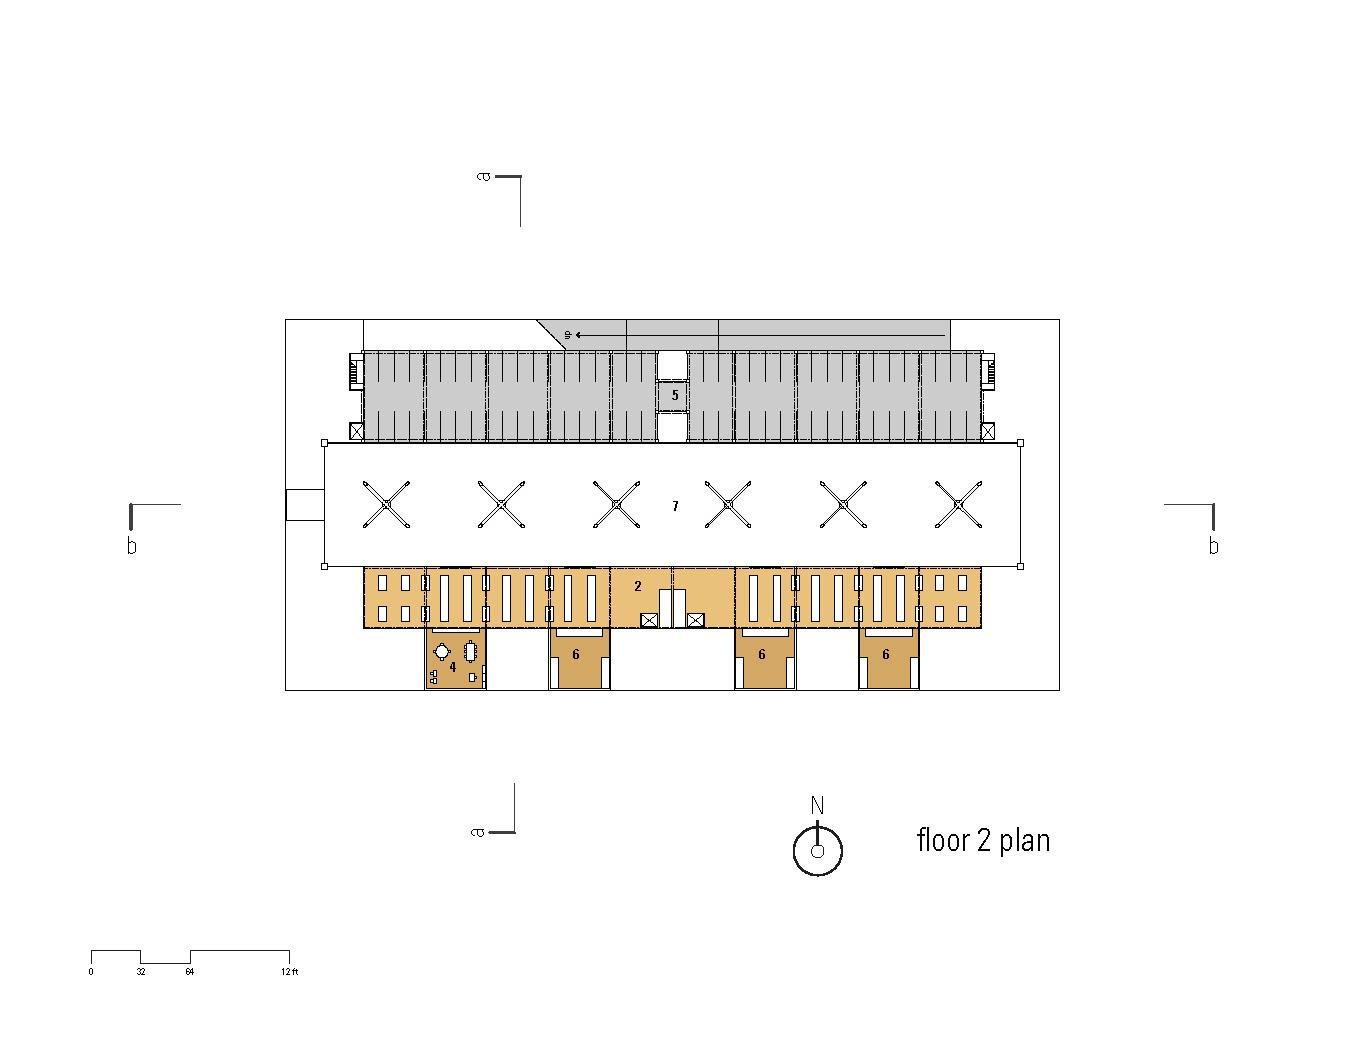 Greengrocer808 2nd floor plan